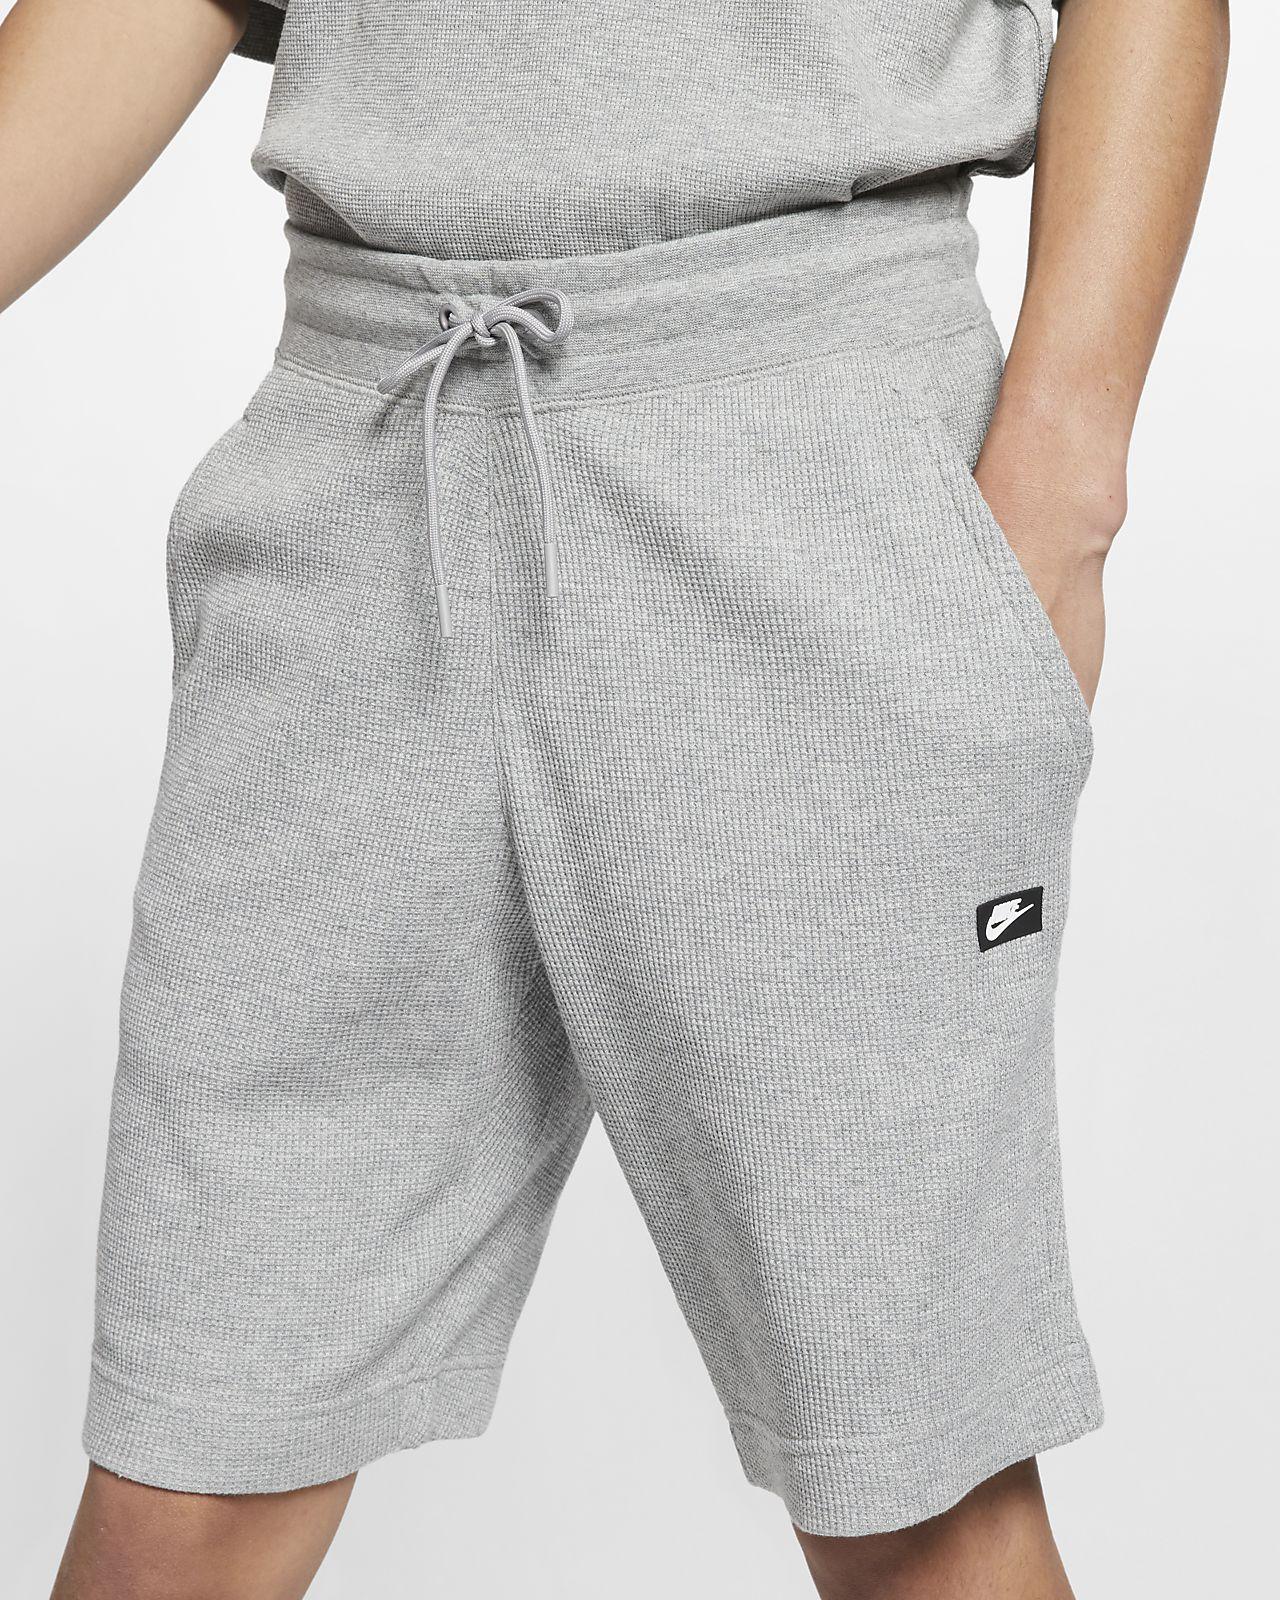 Nike Sportswear 男款短褲